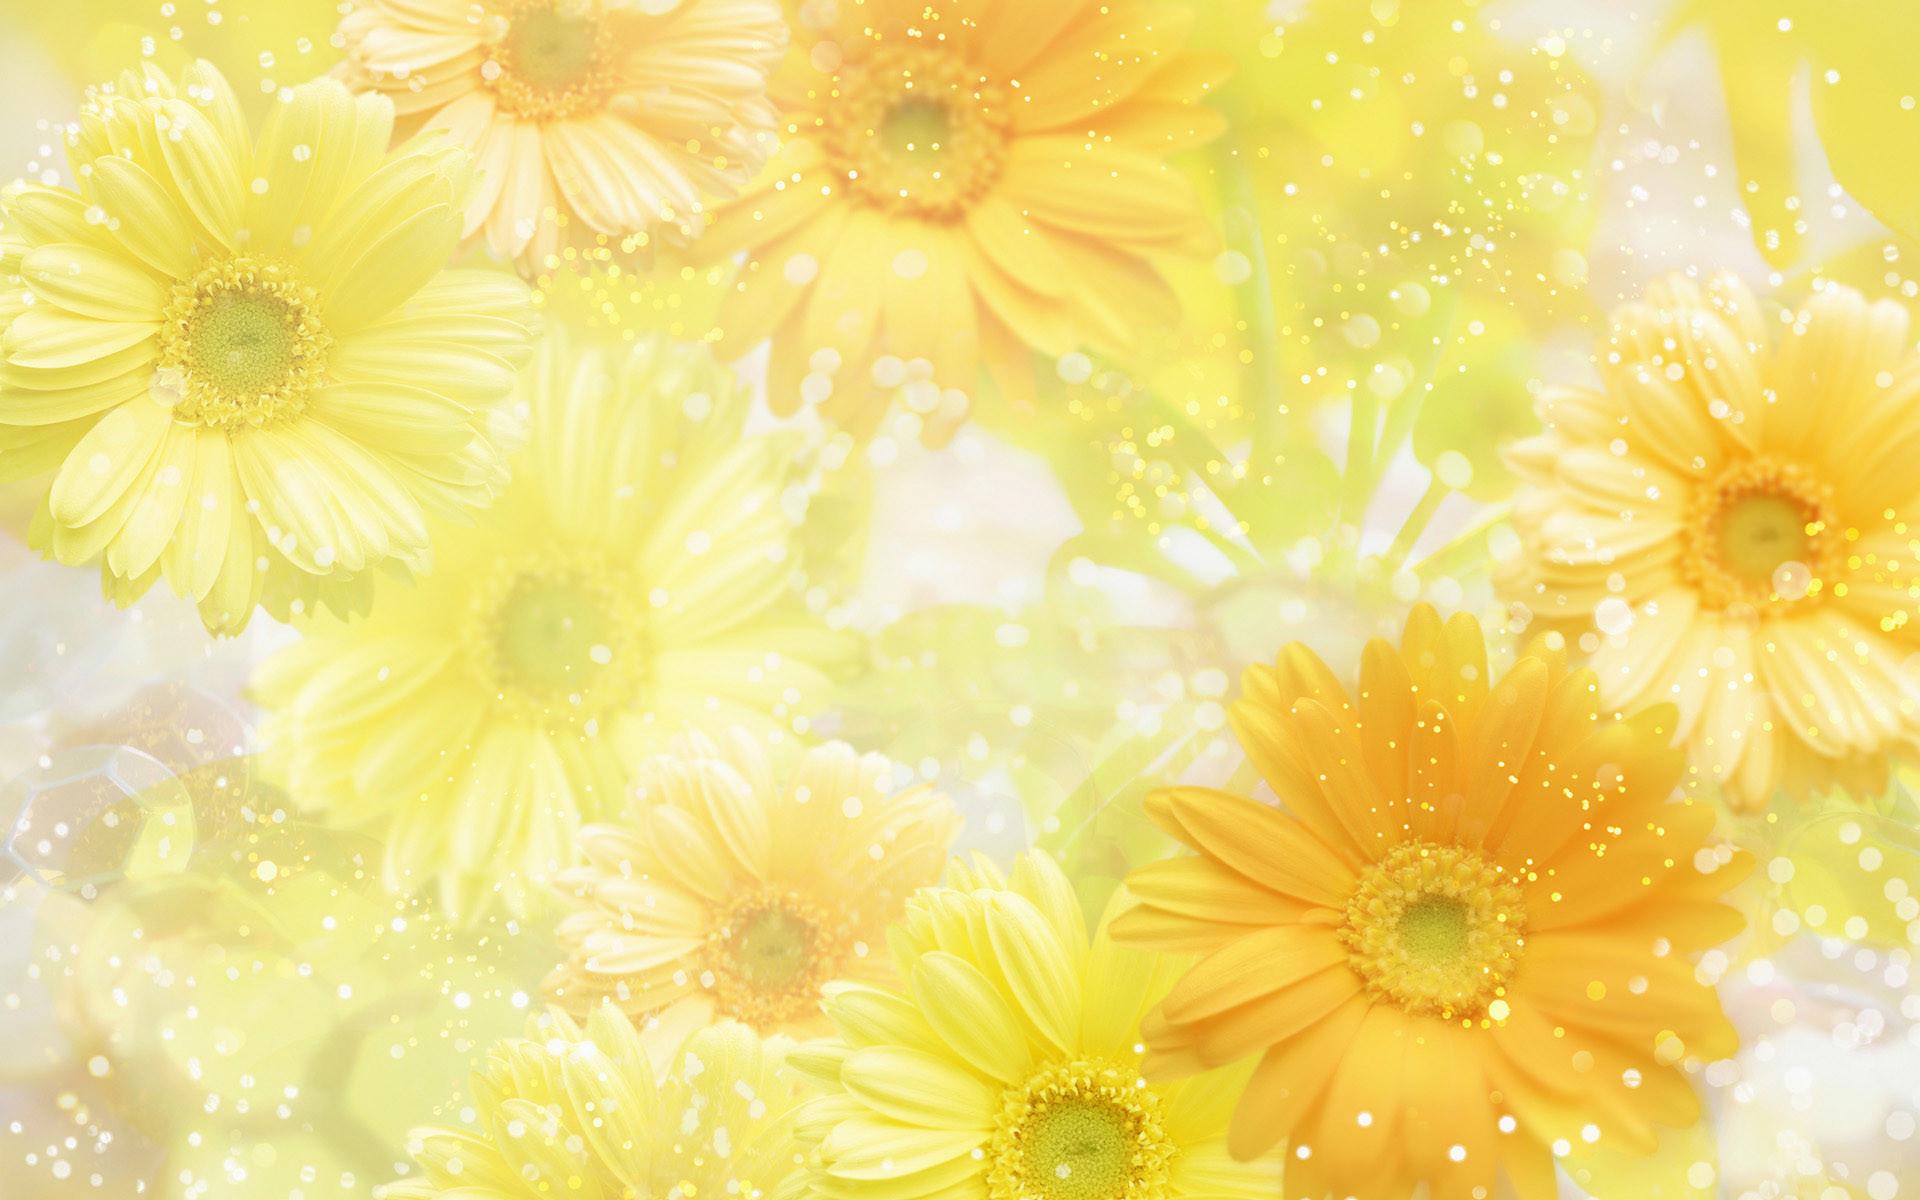 Image for Flowers background Flower wallpaper images of flower 11